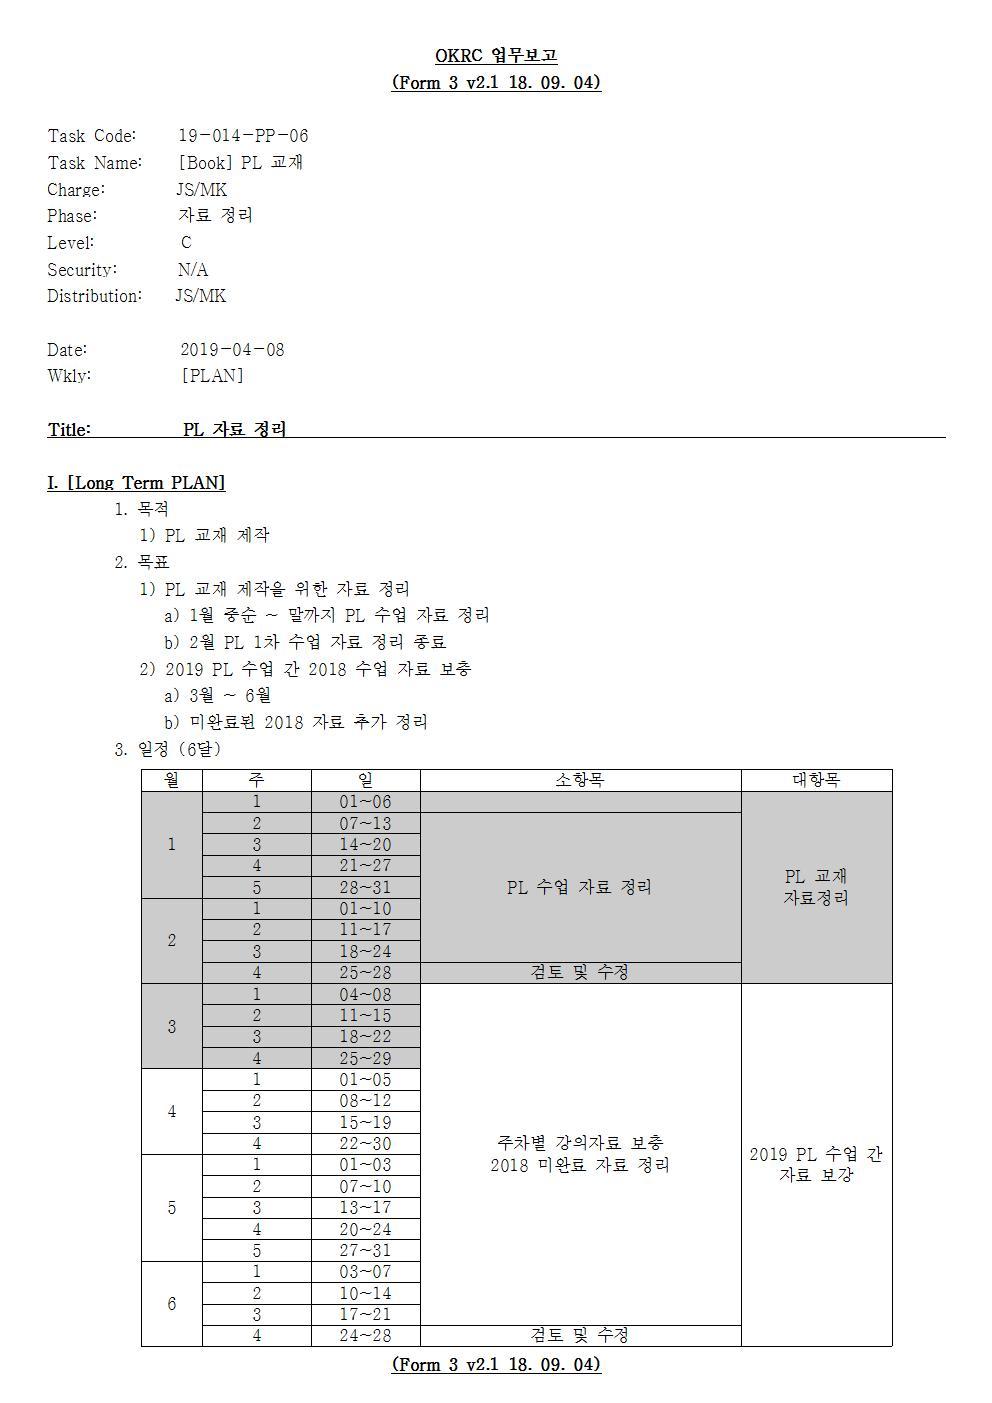 D-[19-014-PP-06]-[Book-PL]-[2019-04-08][JS]001.jpg